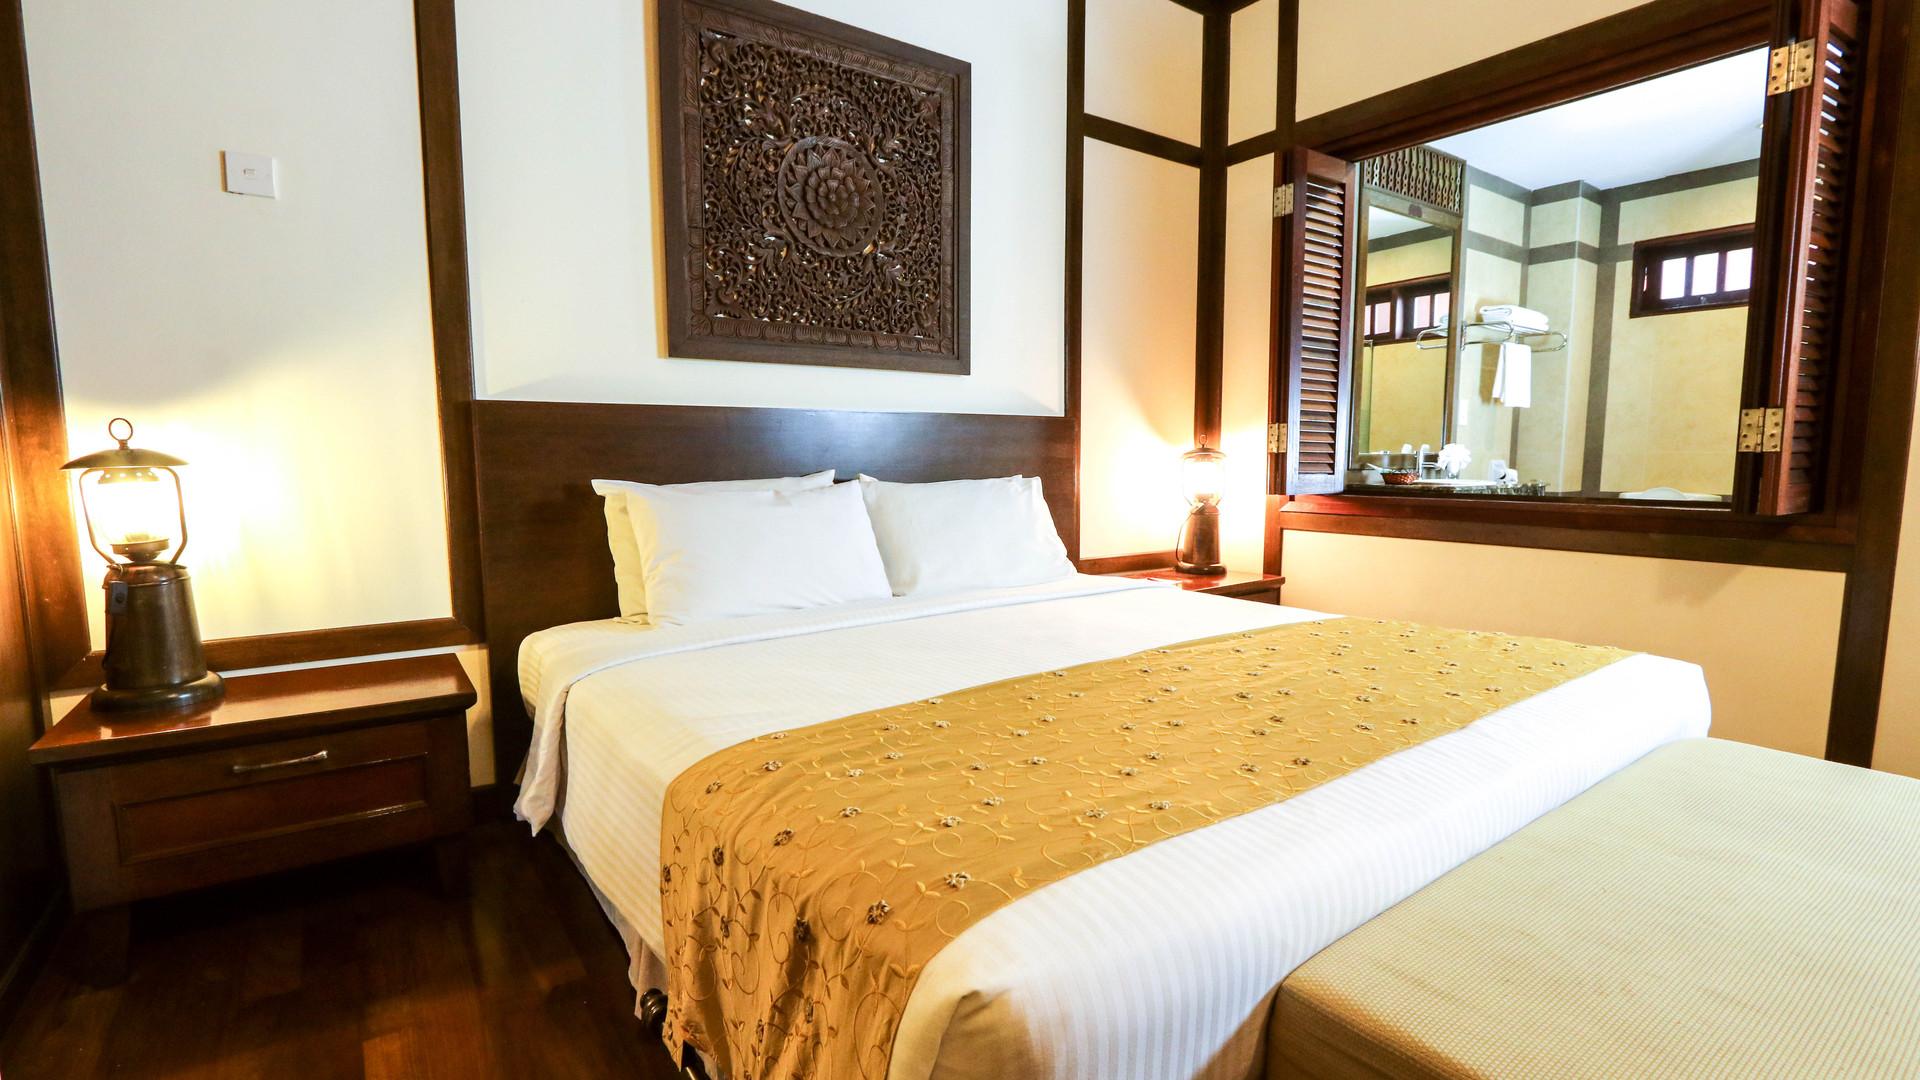 Stay_Kpg Air Room 2.jpg